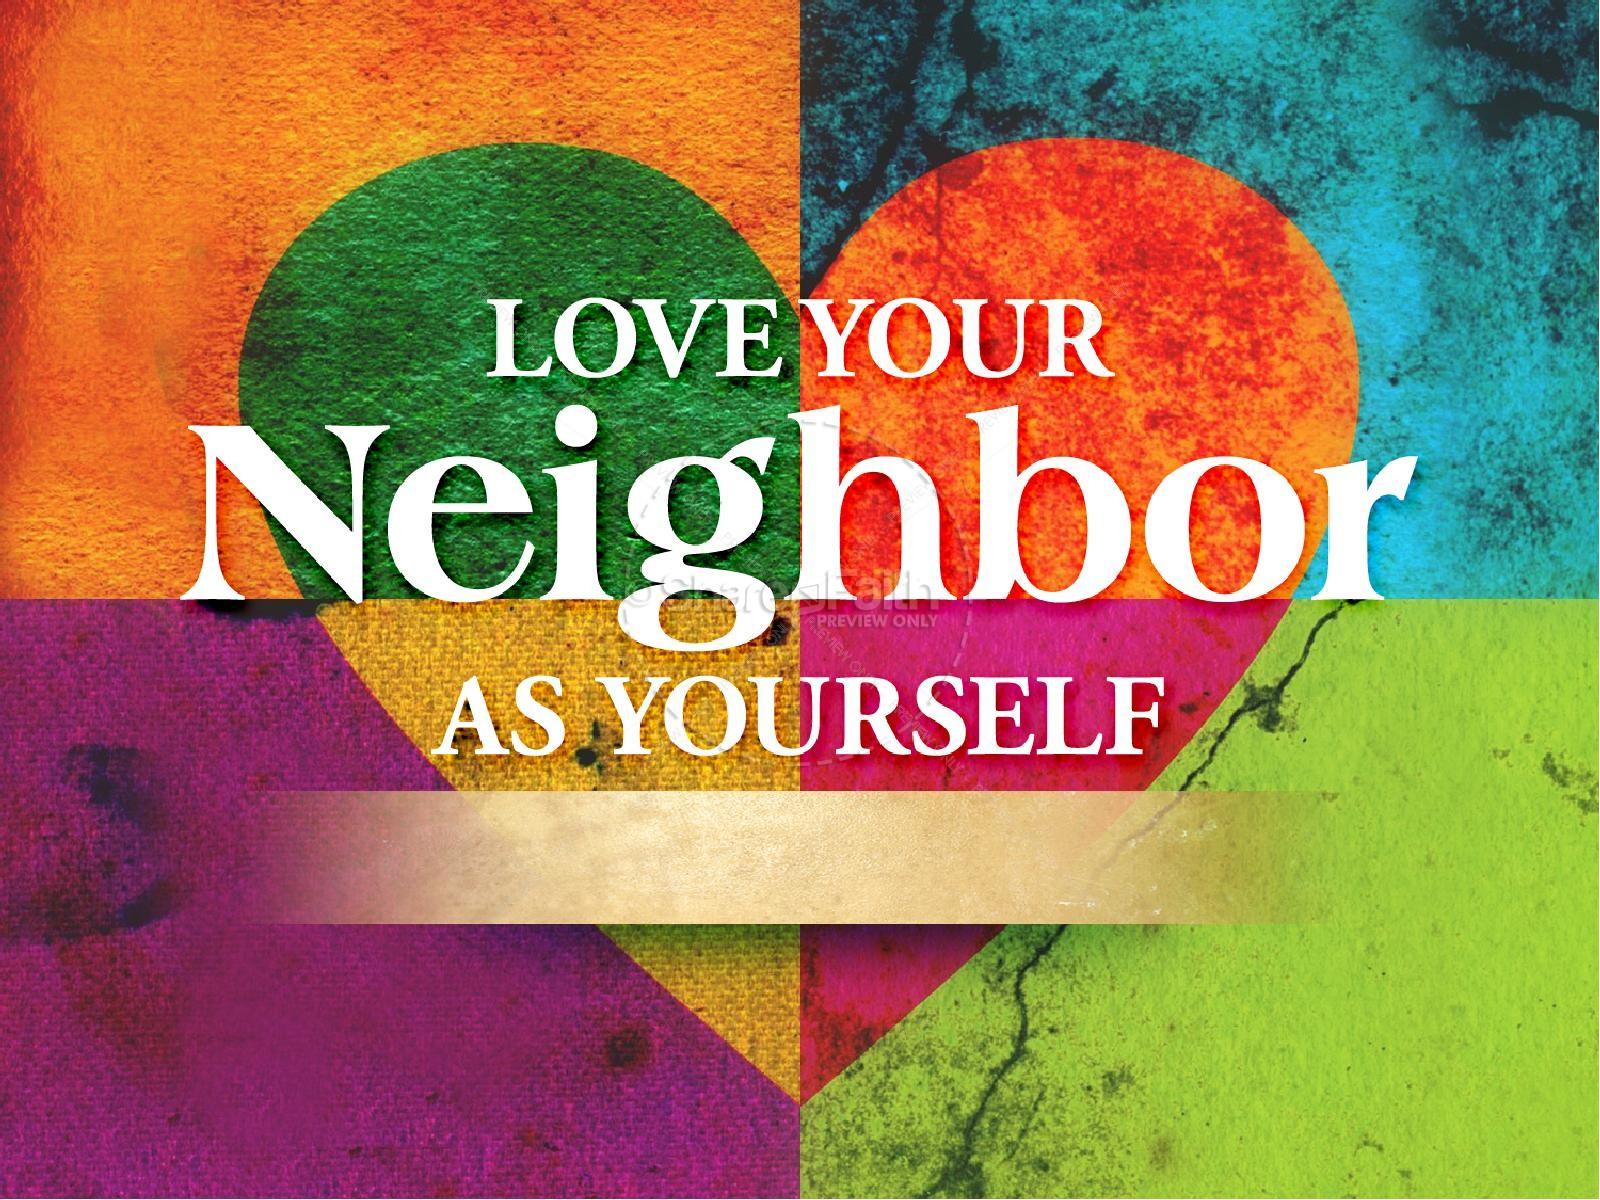 As yourself powerpoint template. Neighborhood clipart love your neighbor